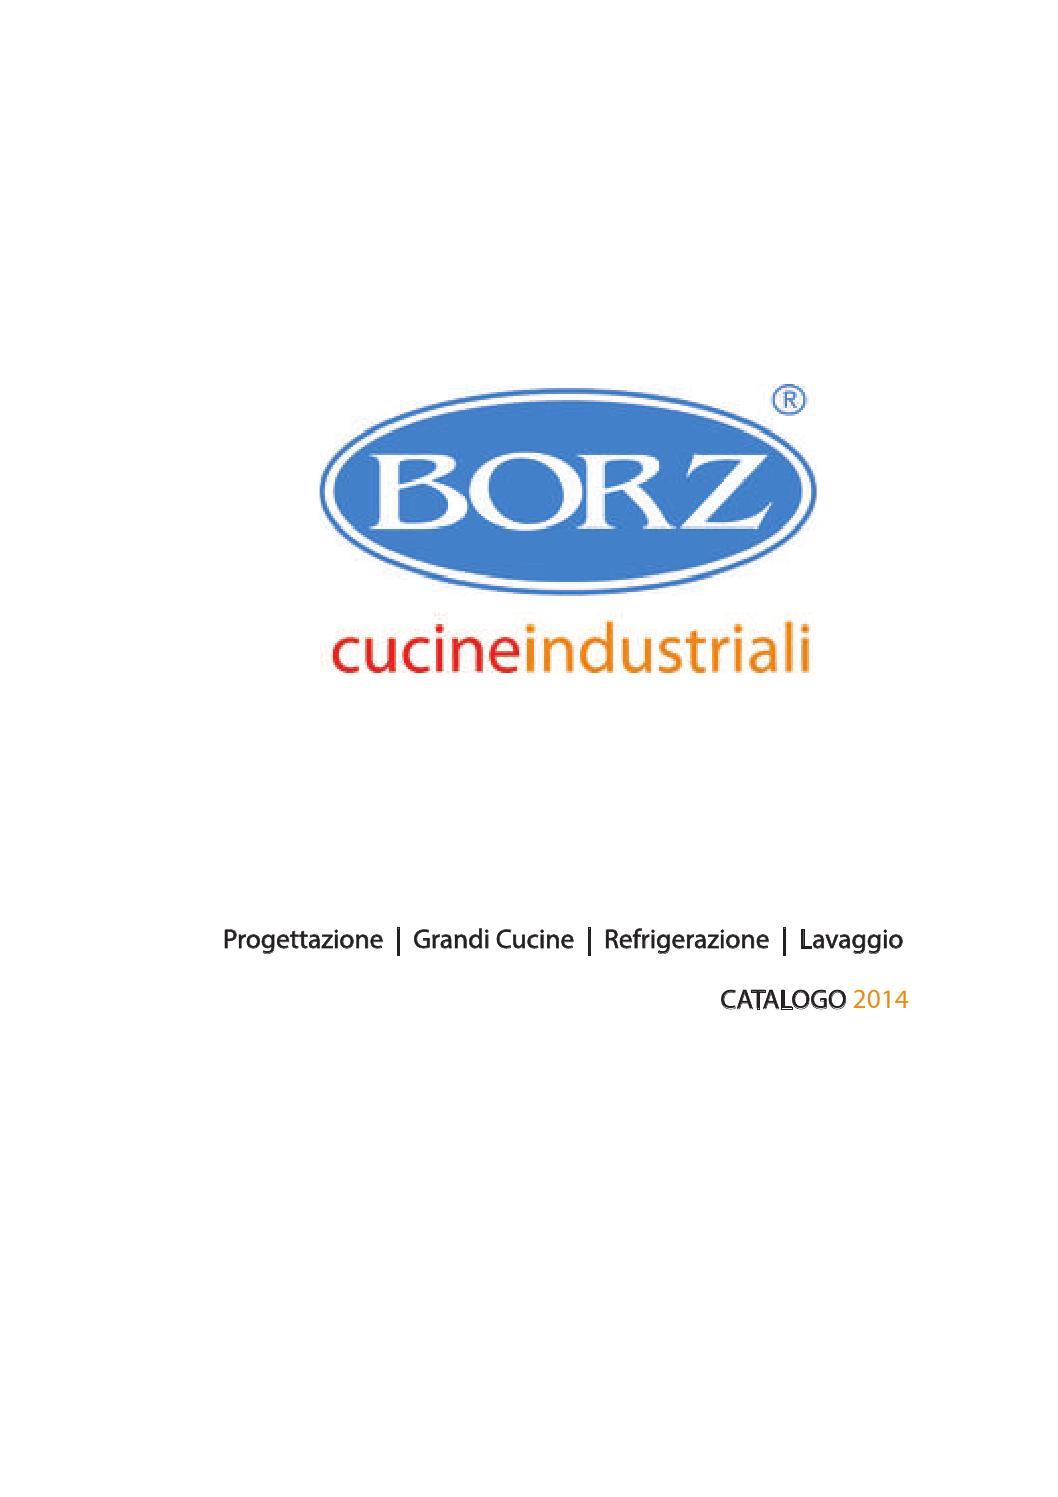 Catalogo borz by borz cucine industriali issuu - Progettazione cucine on line ...